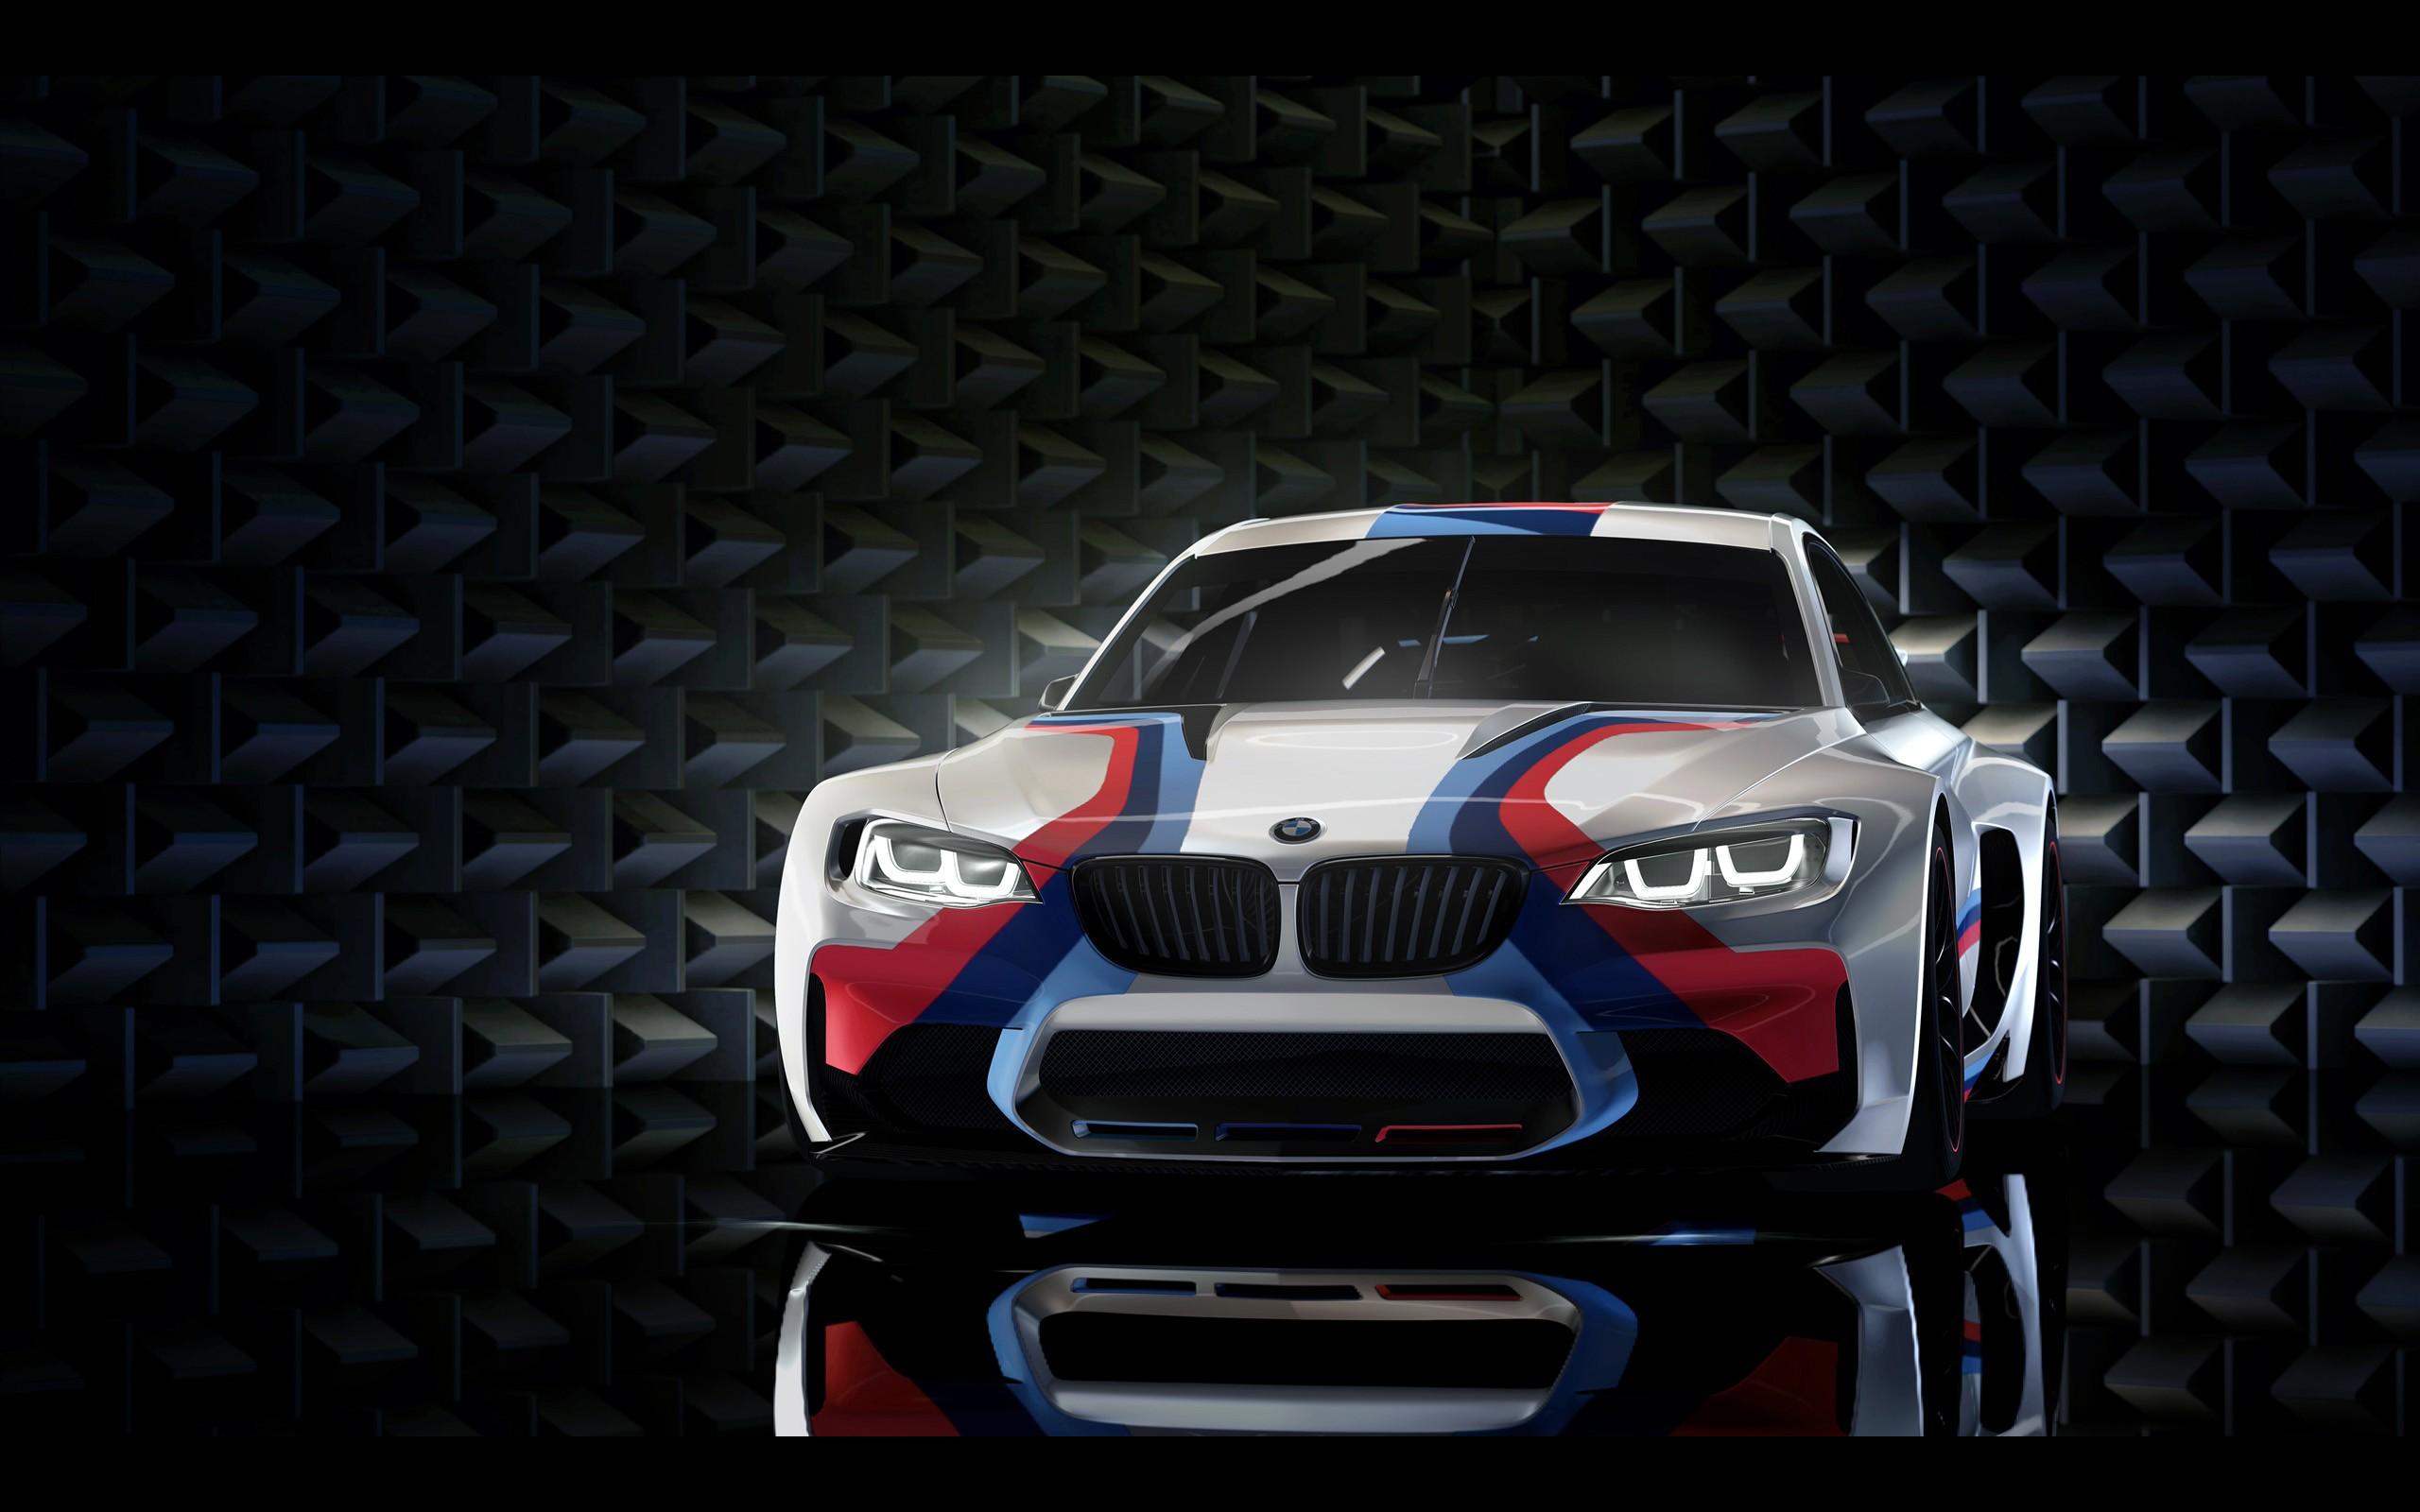 2014 Bmw Vision Gran Turismo Wallpaper Hd Car Wallpapers